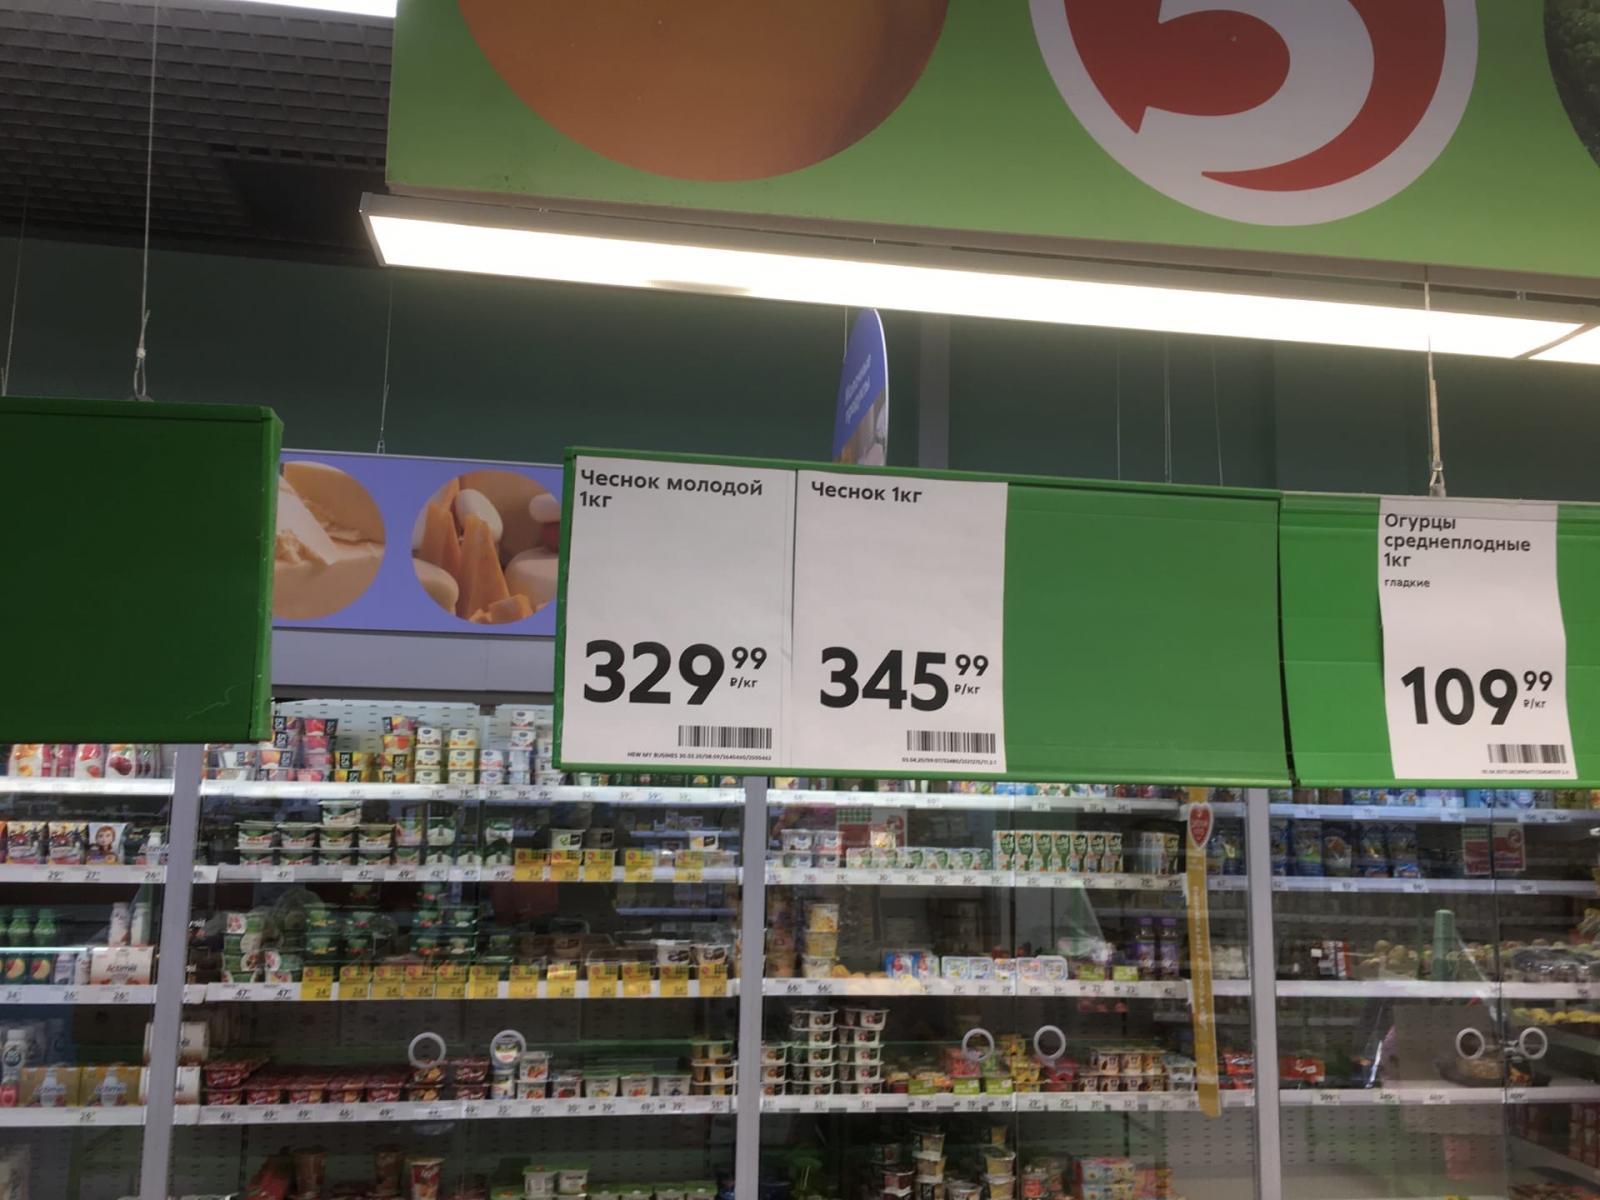 Брянцев шокировали цены на чеснок